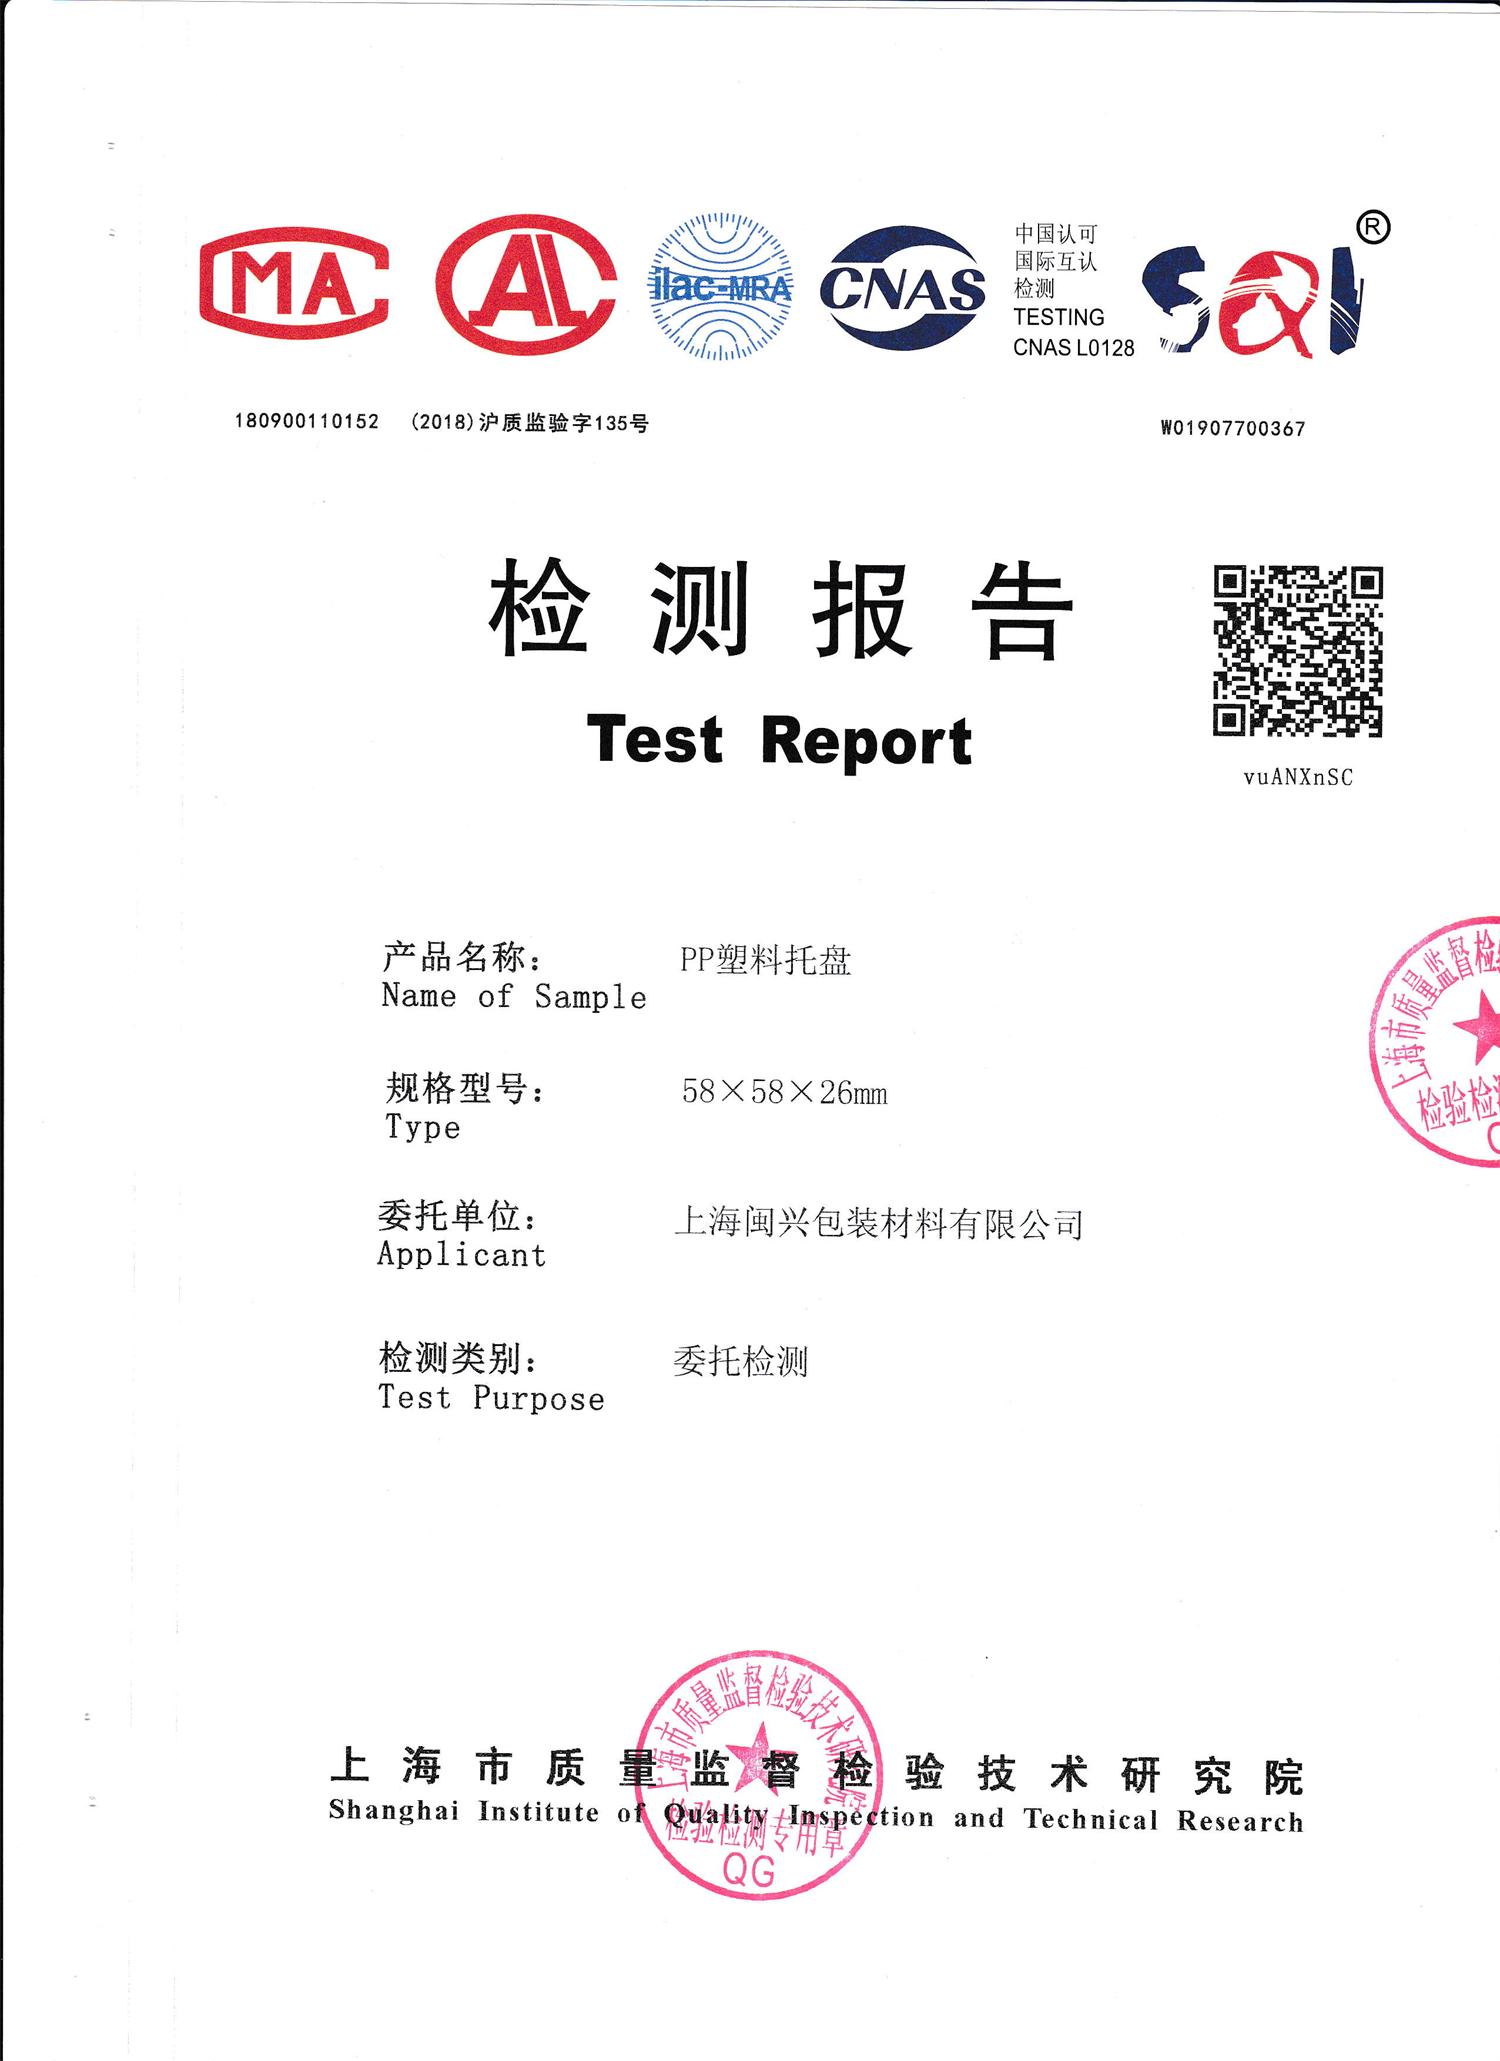 PP检测报告